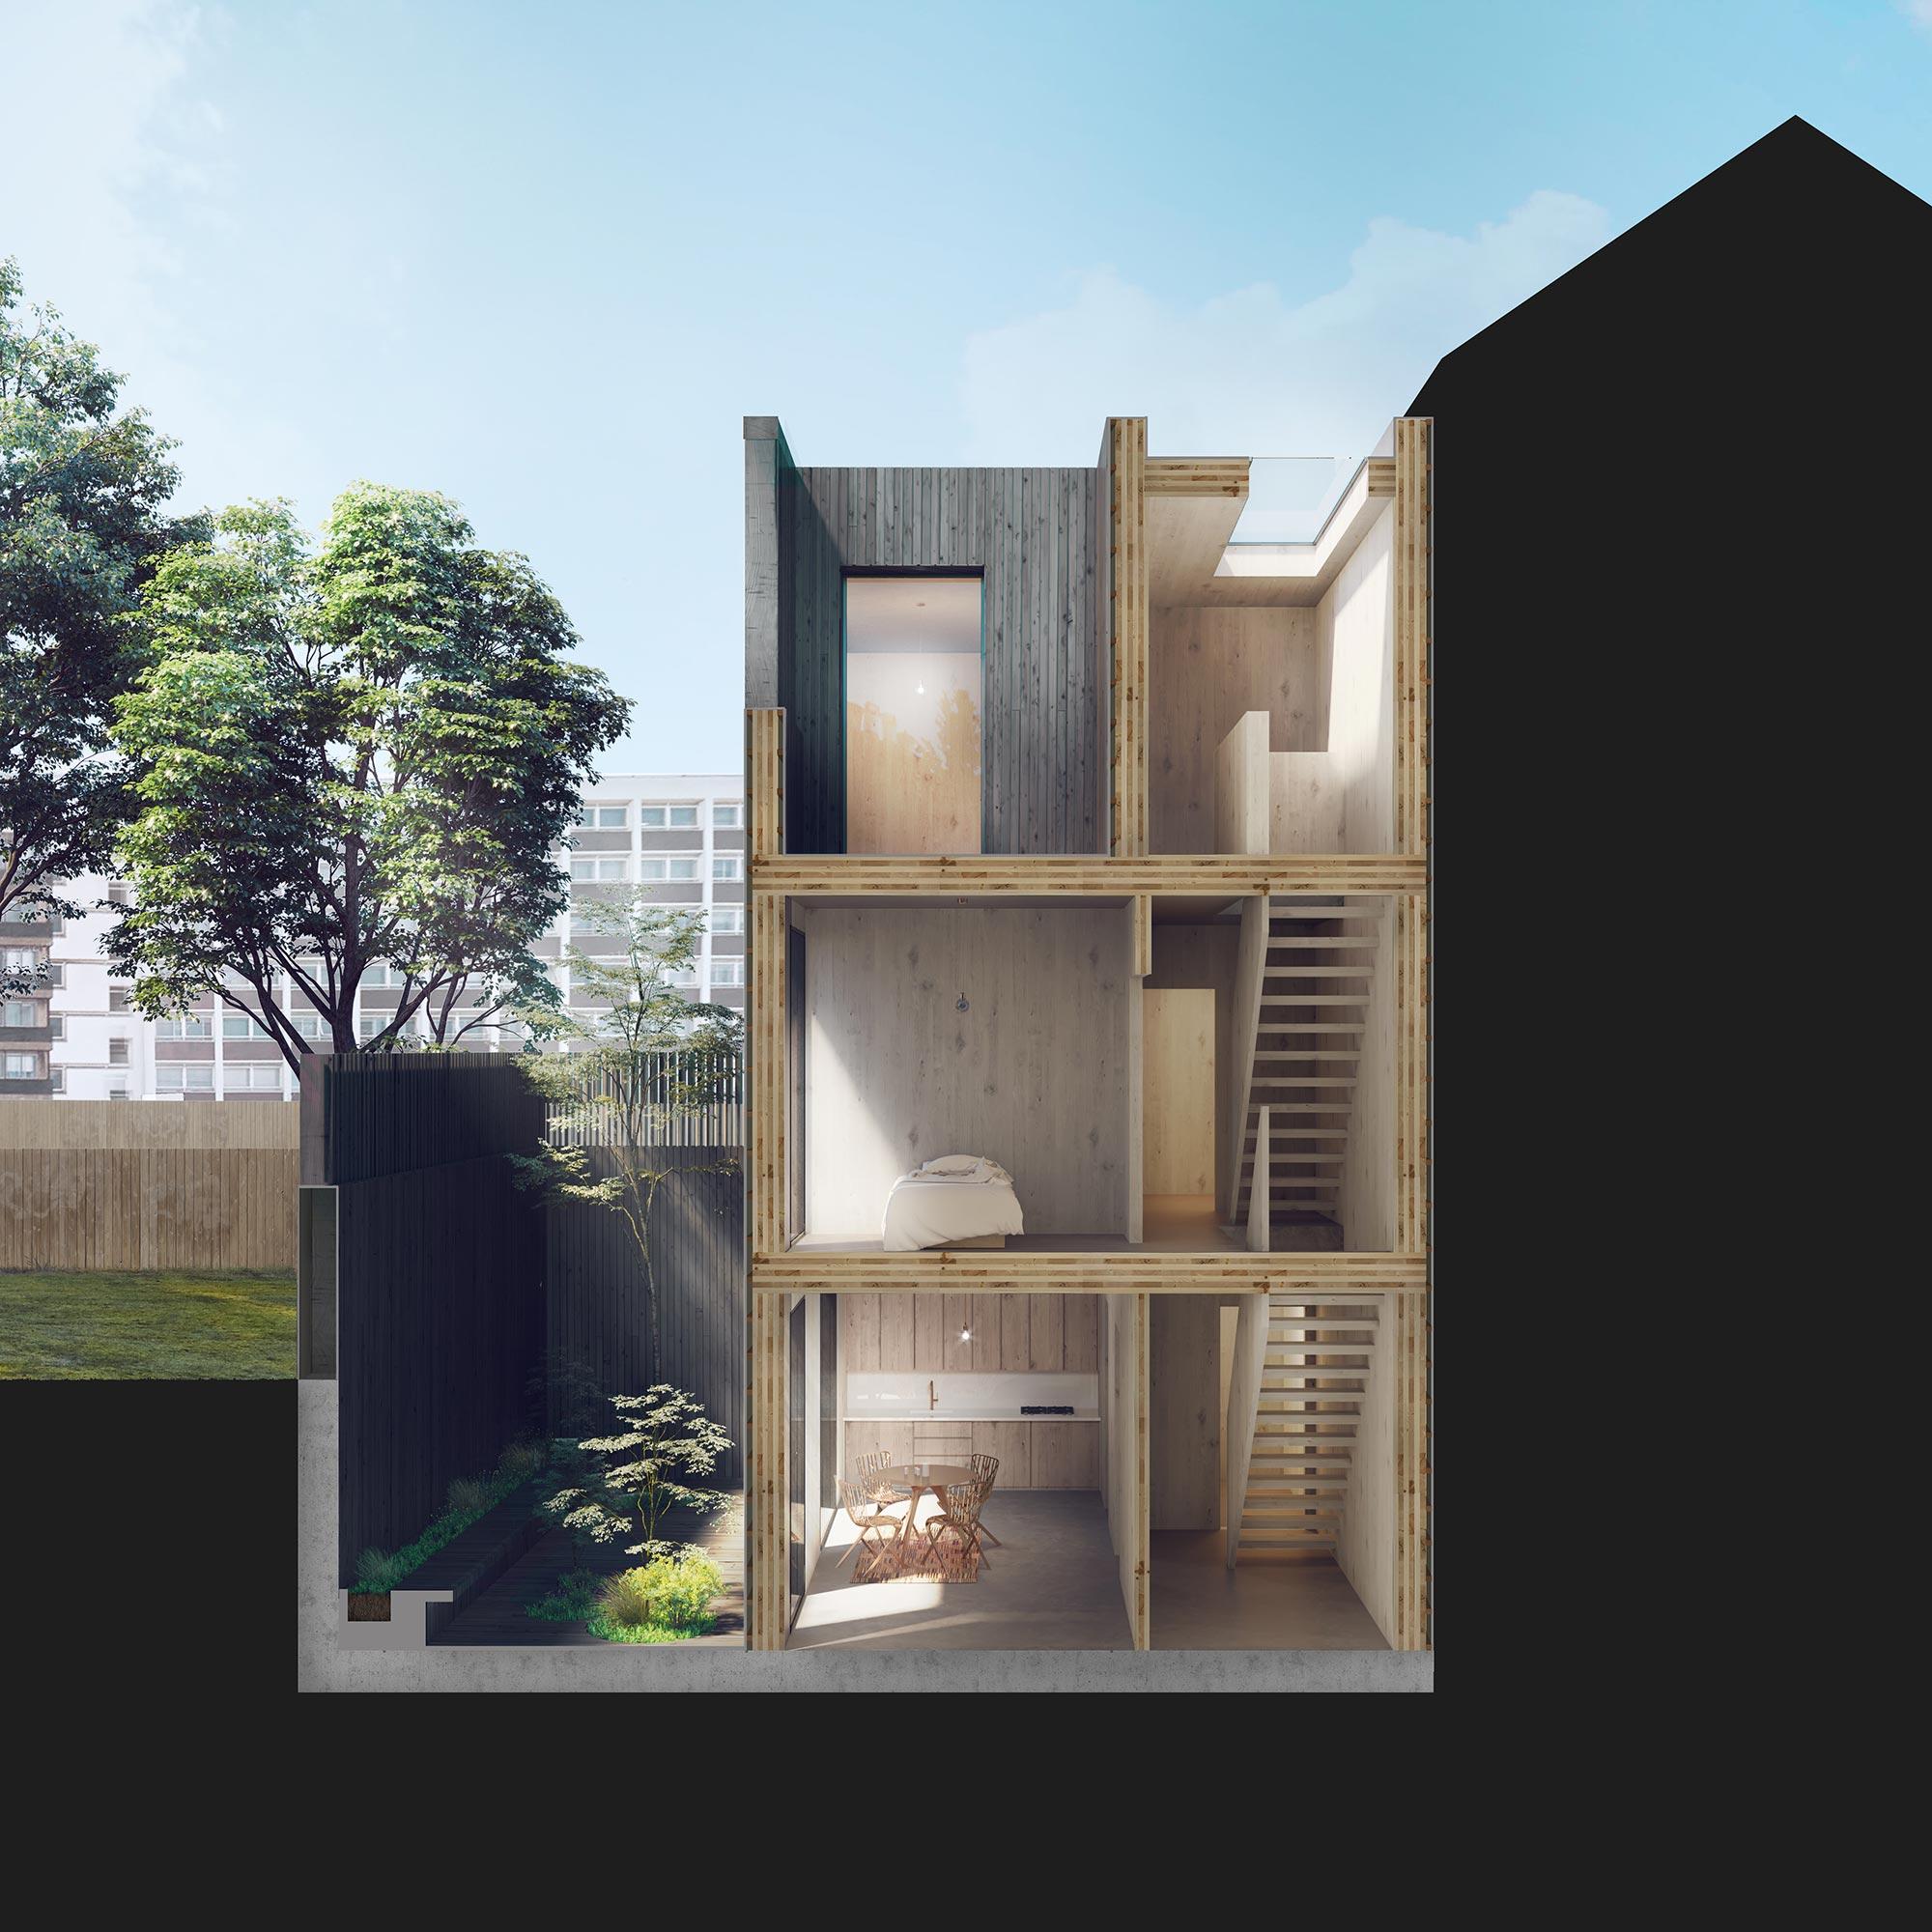 Mobile Home Design Uk: Adjaye Associates